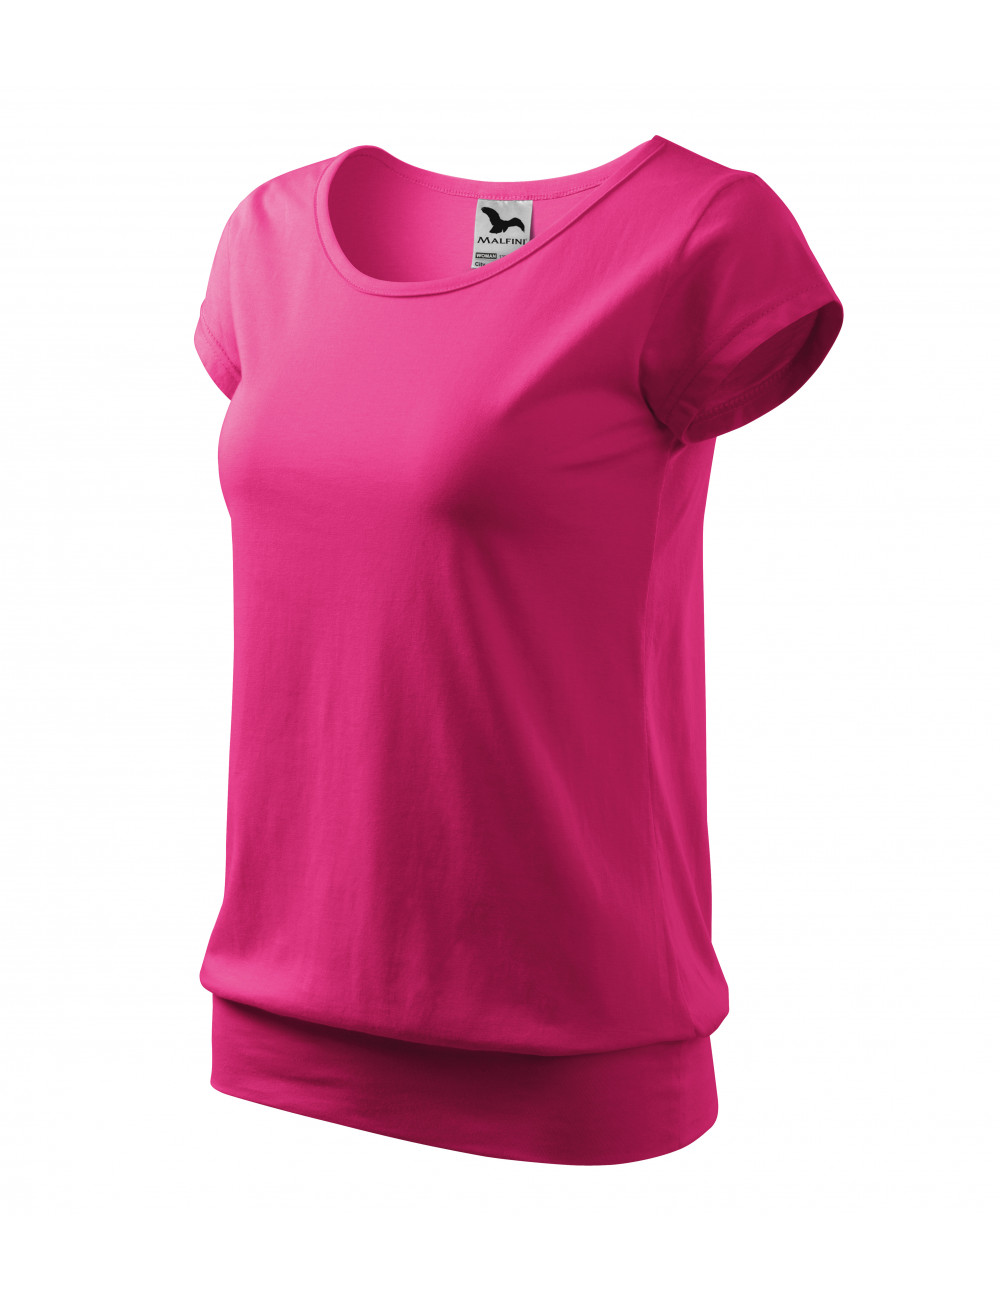 Adler MALFINI Koszulka damska City 120 czerwień purpurowa